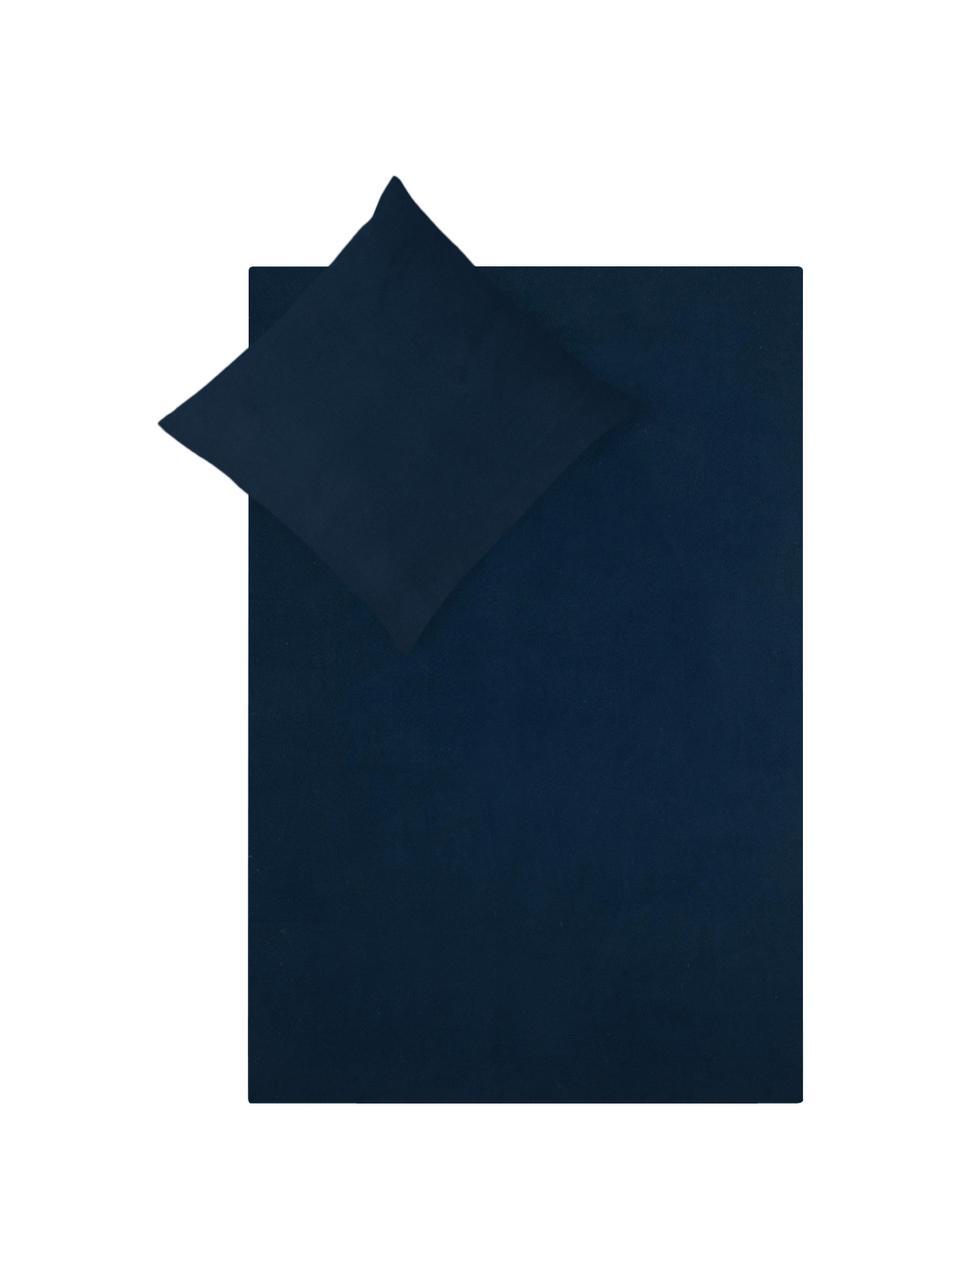 Flanell-Bettwäsche Biba in Navyblau, Webart: Flanell Flanell ist ein k, Navyblau, 135 x 200 cm + 1 Kissen 80 x 80 cm